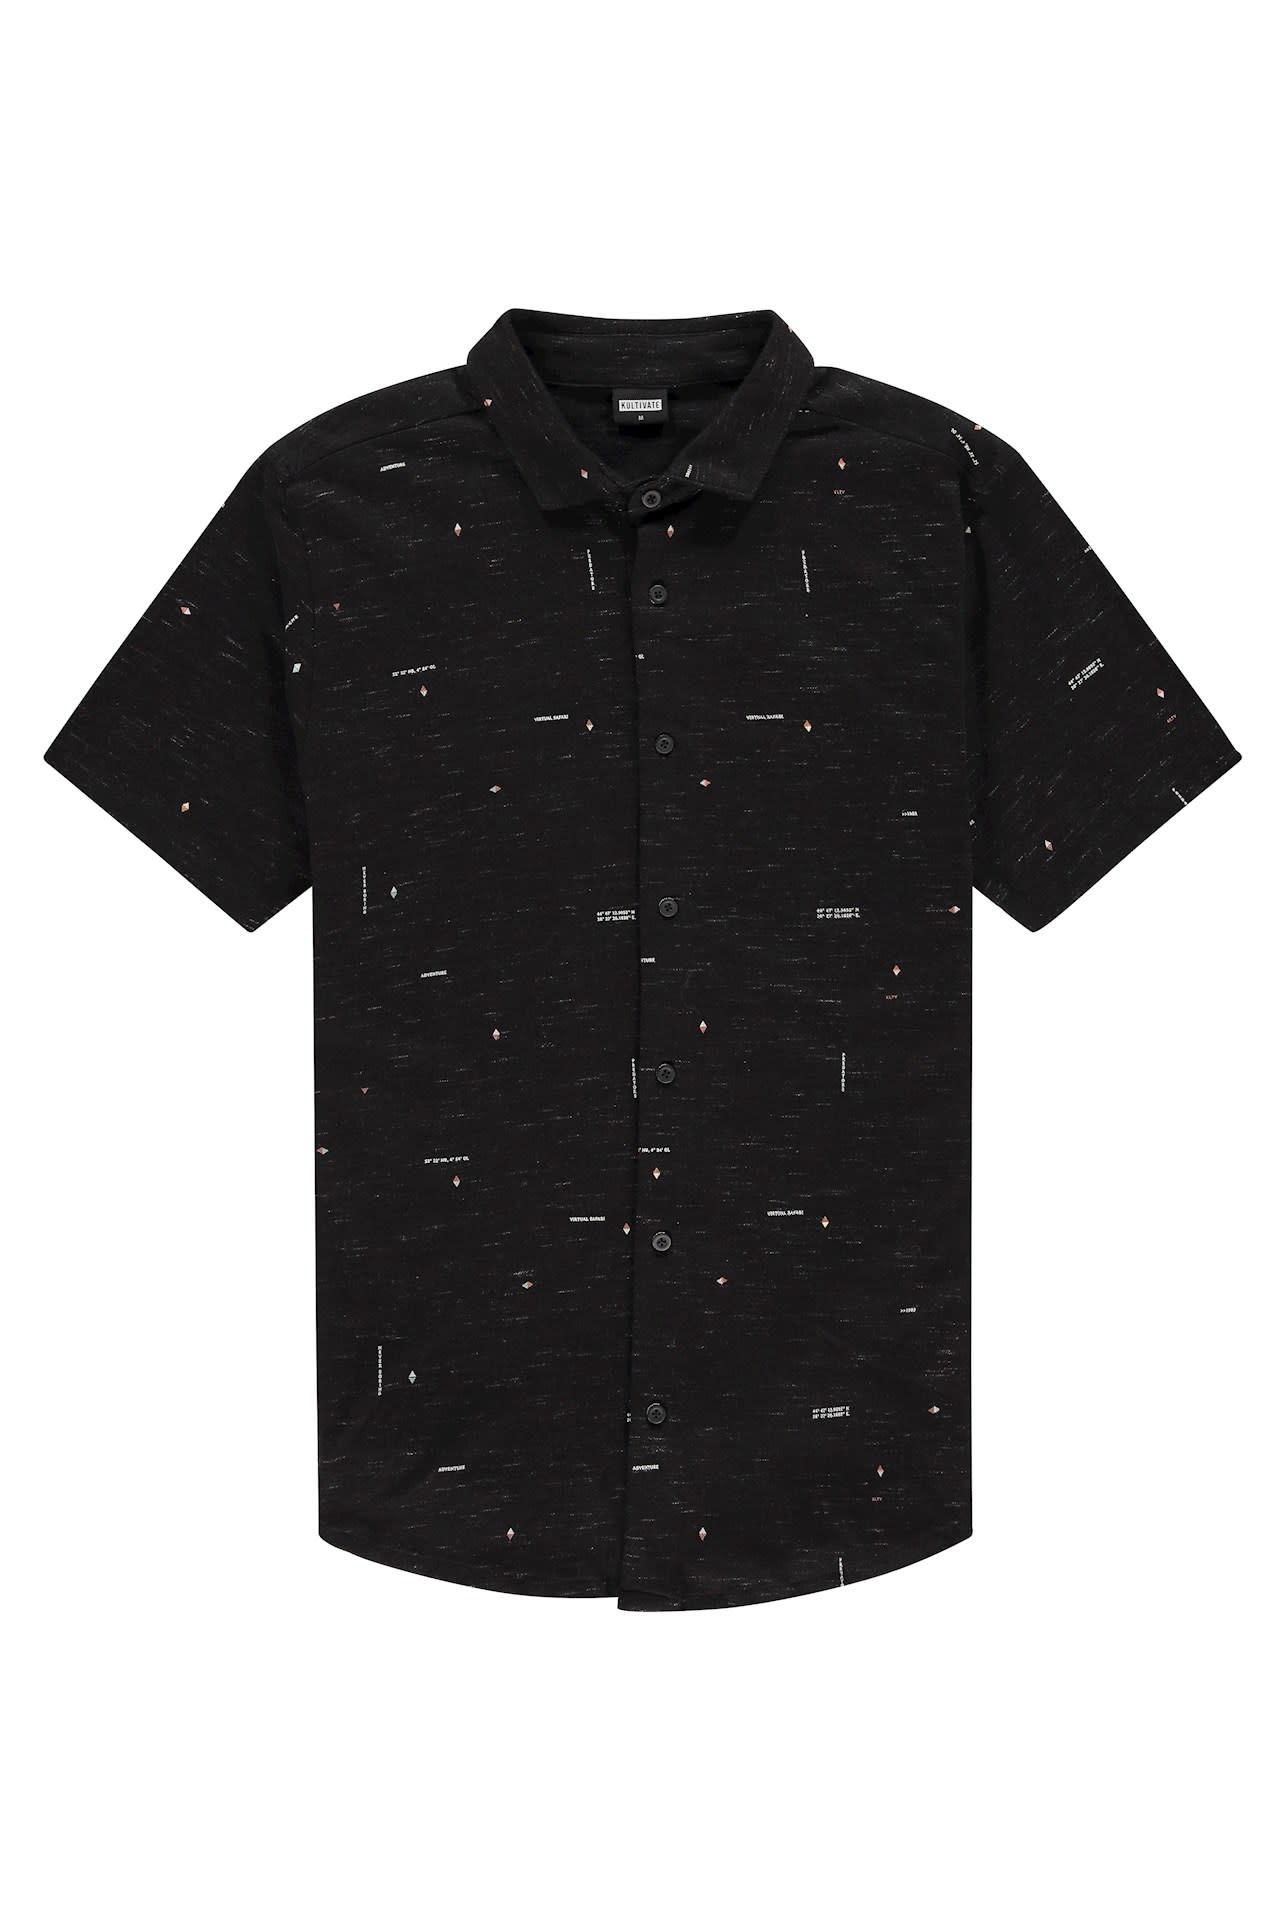 Kultivate Kultivate Coordinates Shirt Black